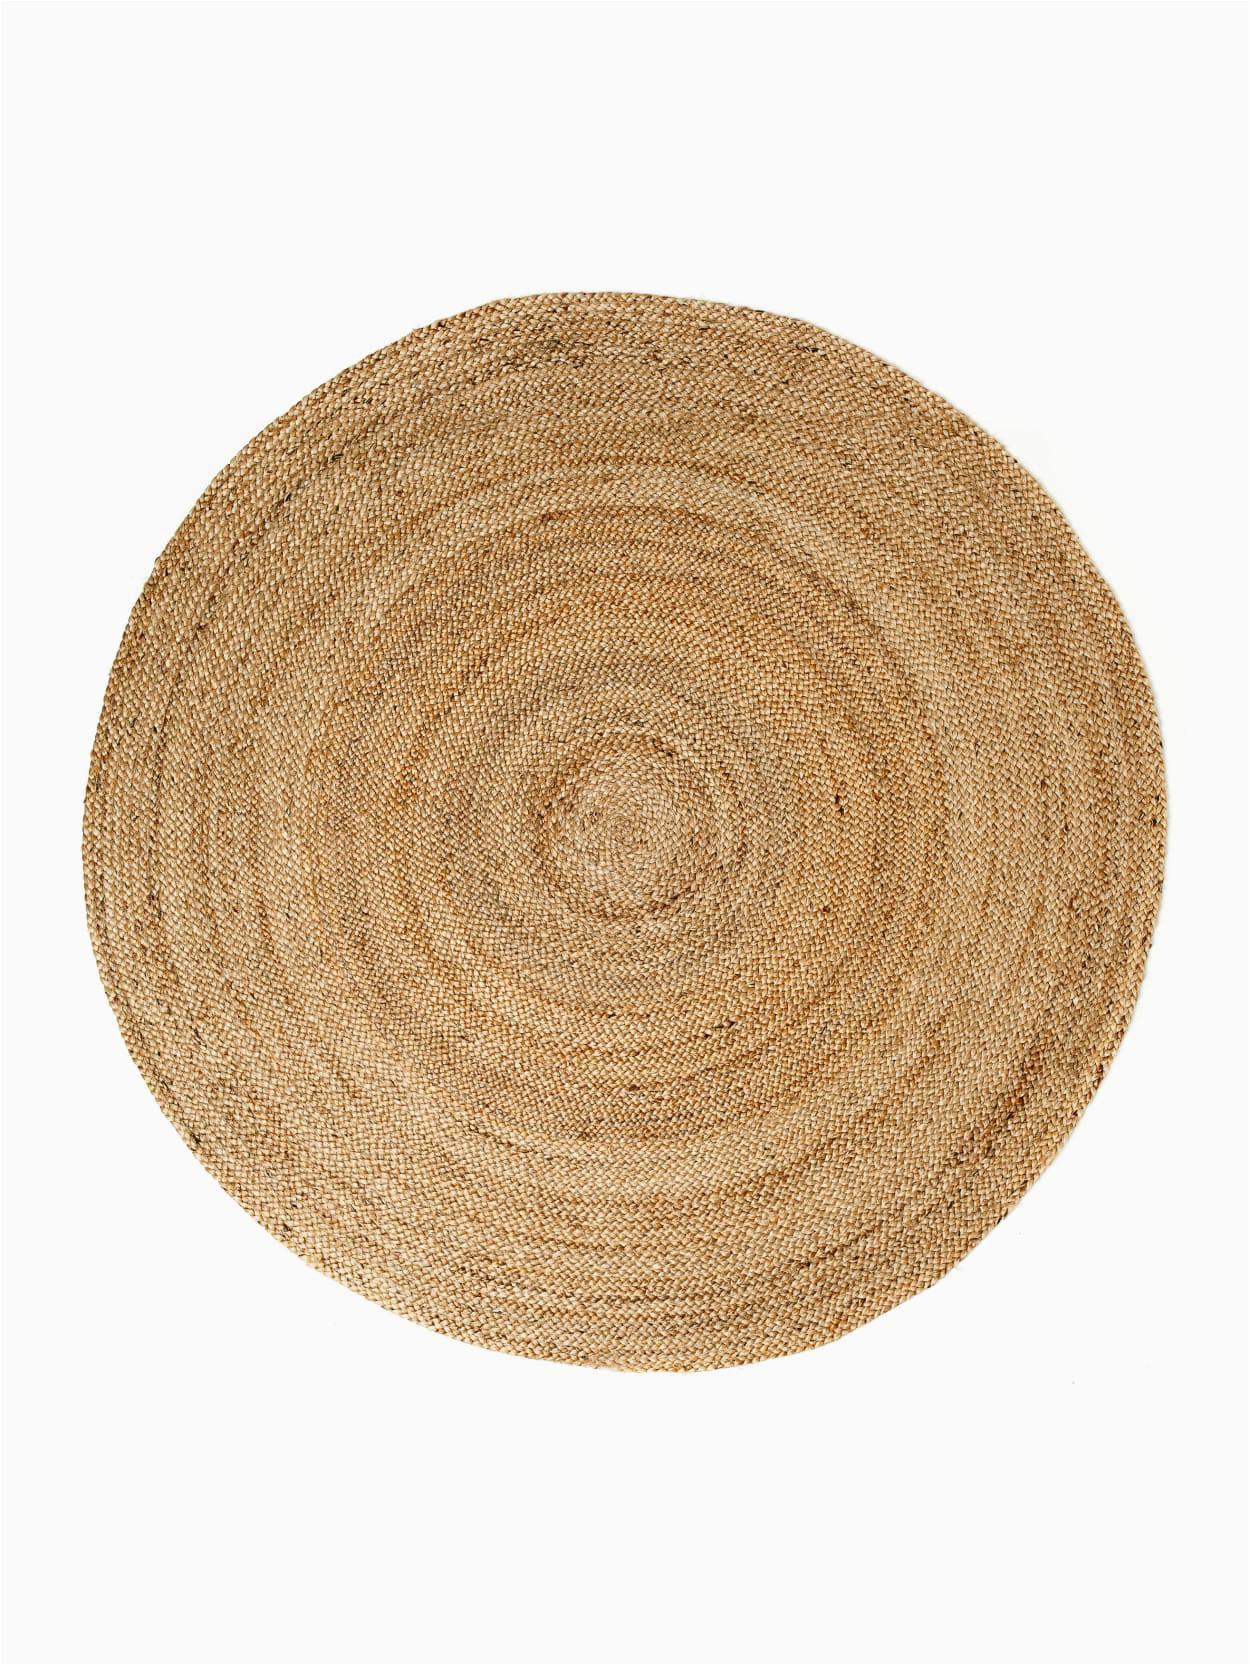 o01 6ft round kerala natural jute rug